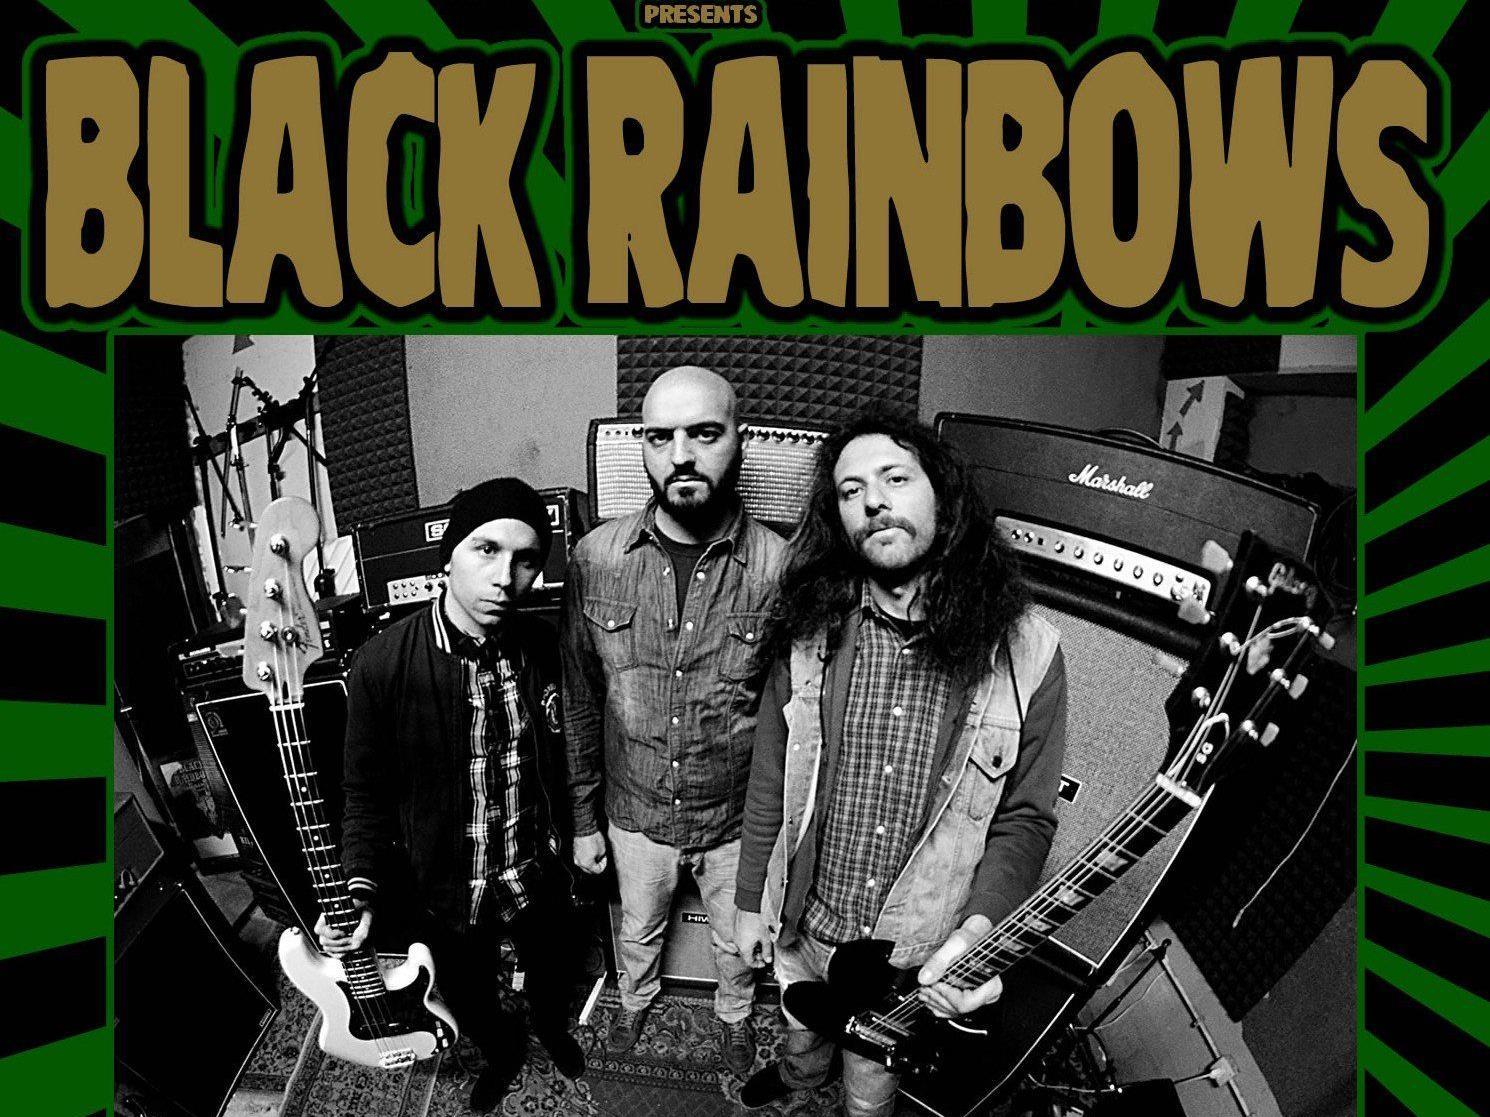 Black Rainbows live in concert.